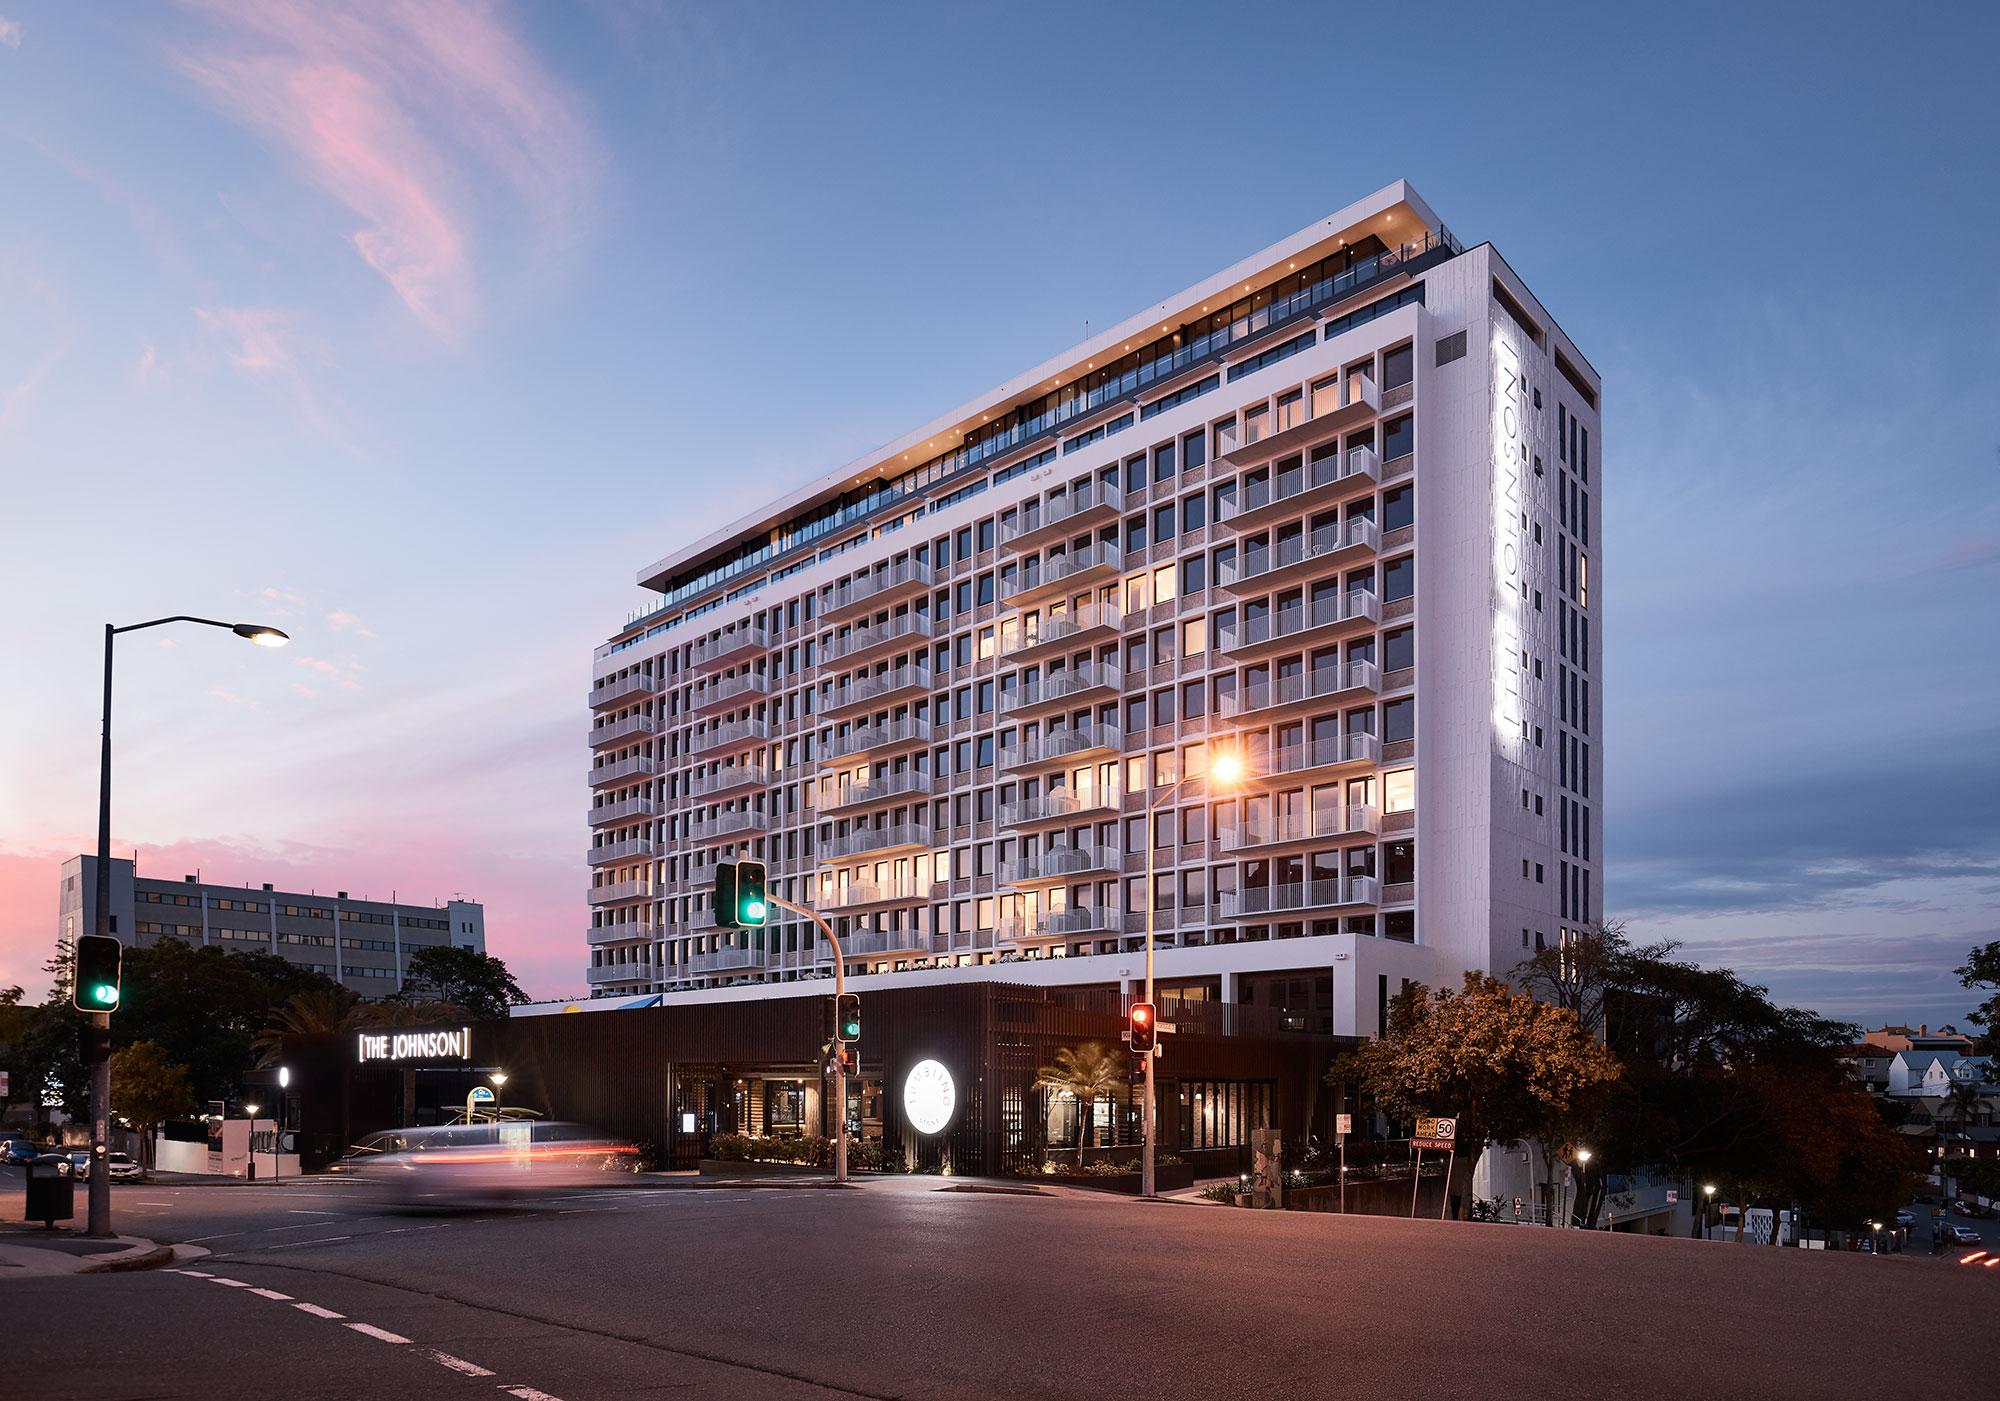 ArtSeries_TheJohnson_Exteriors_160_LR_Brisbane_supplied by hotel.jpg